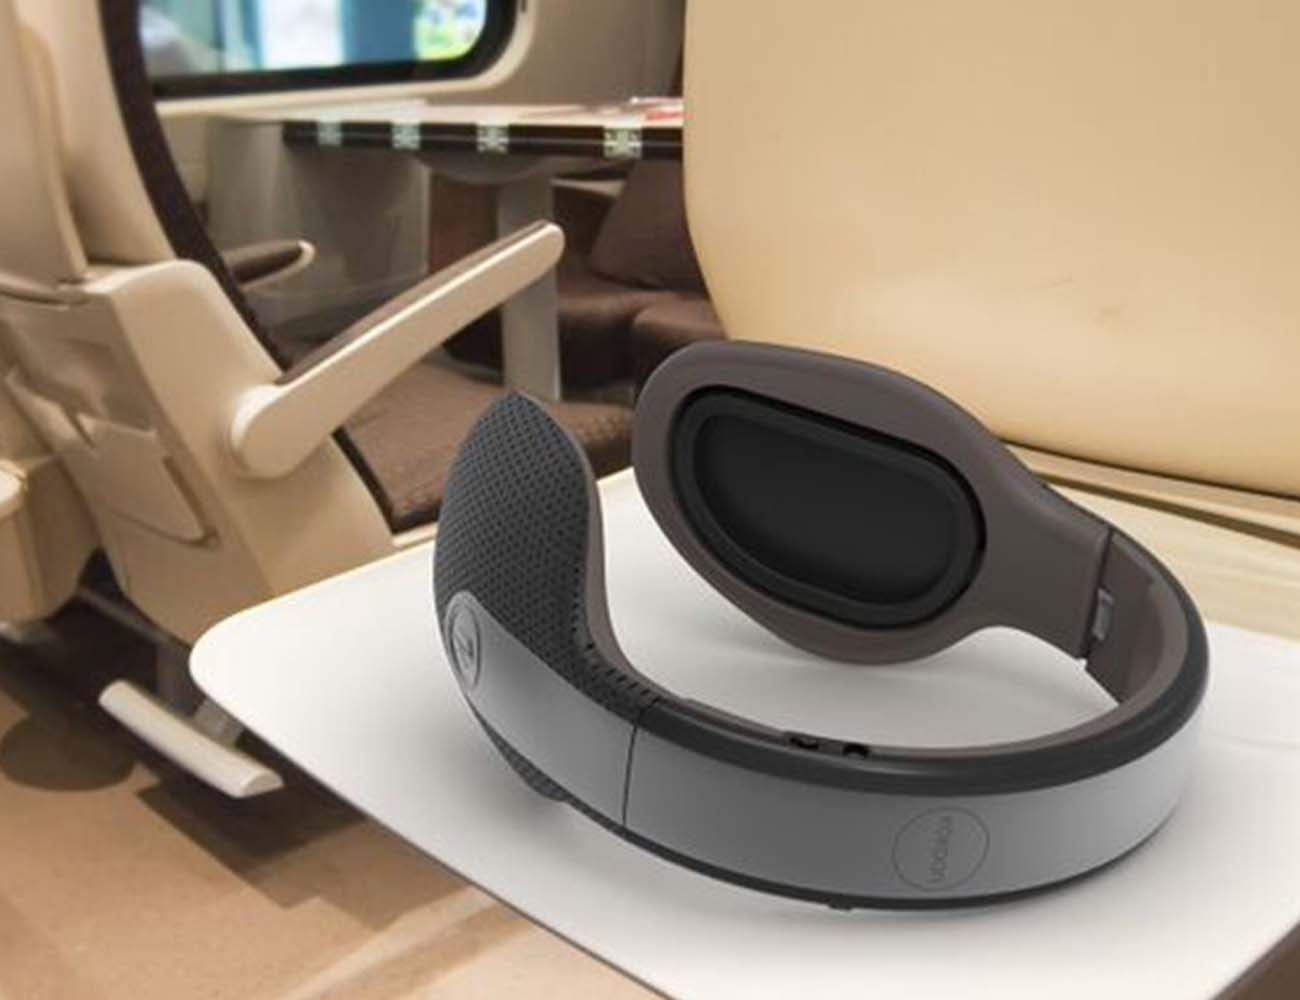 The Ultimate Sleep Sanctuary: Kokoon EEG Headphones